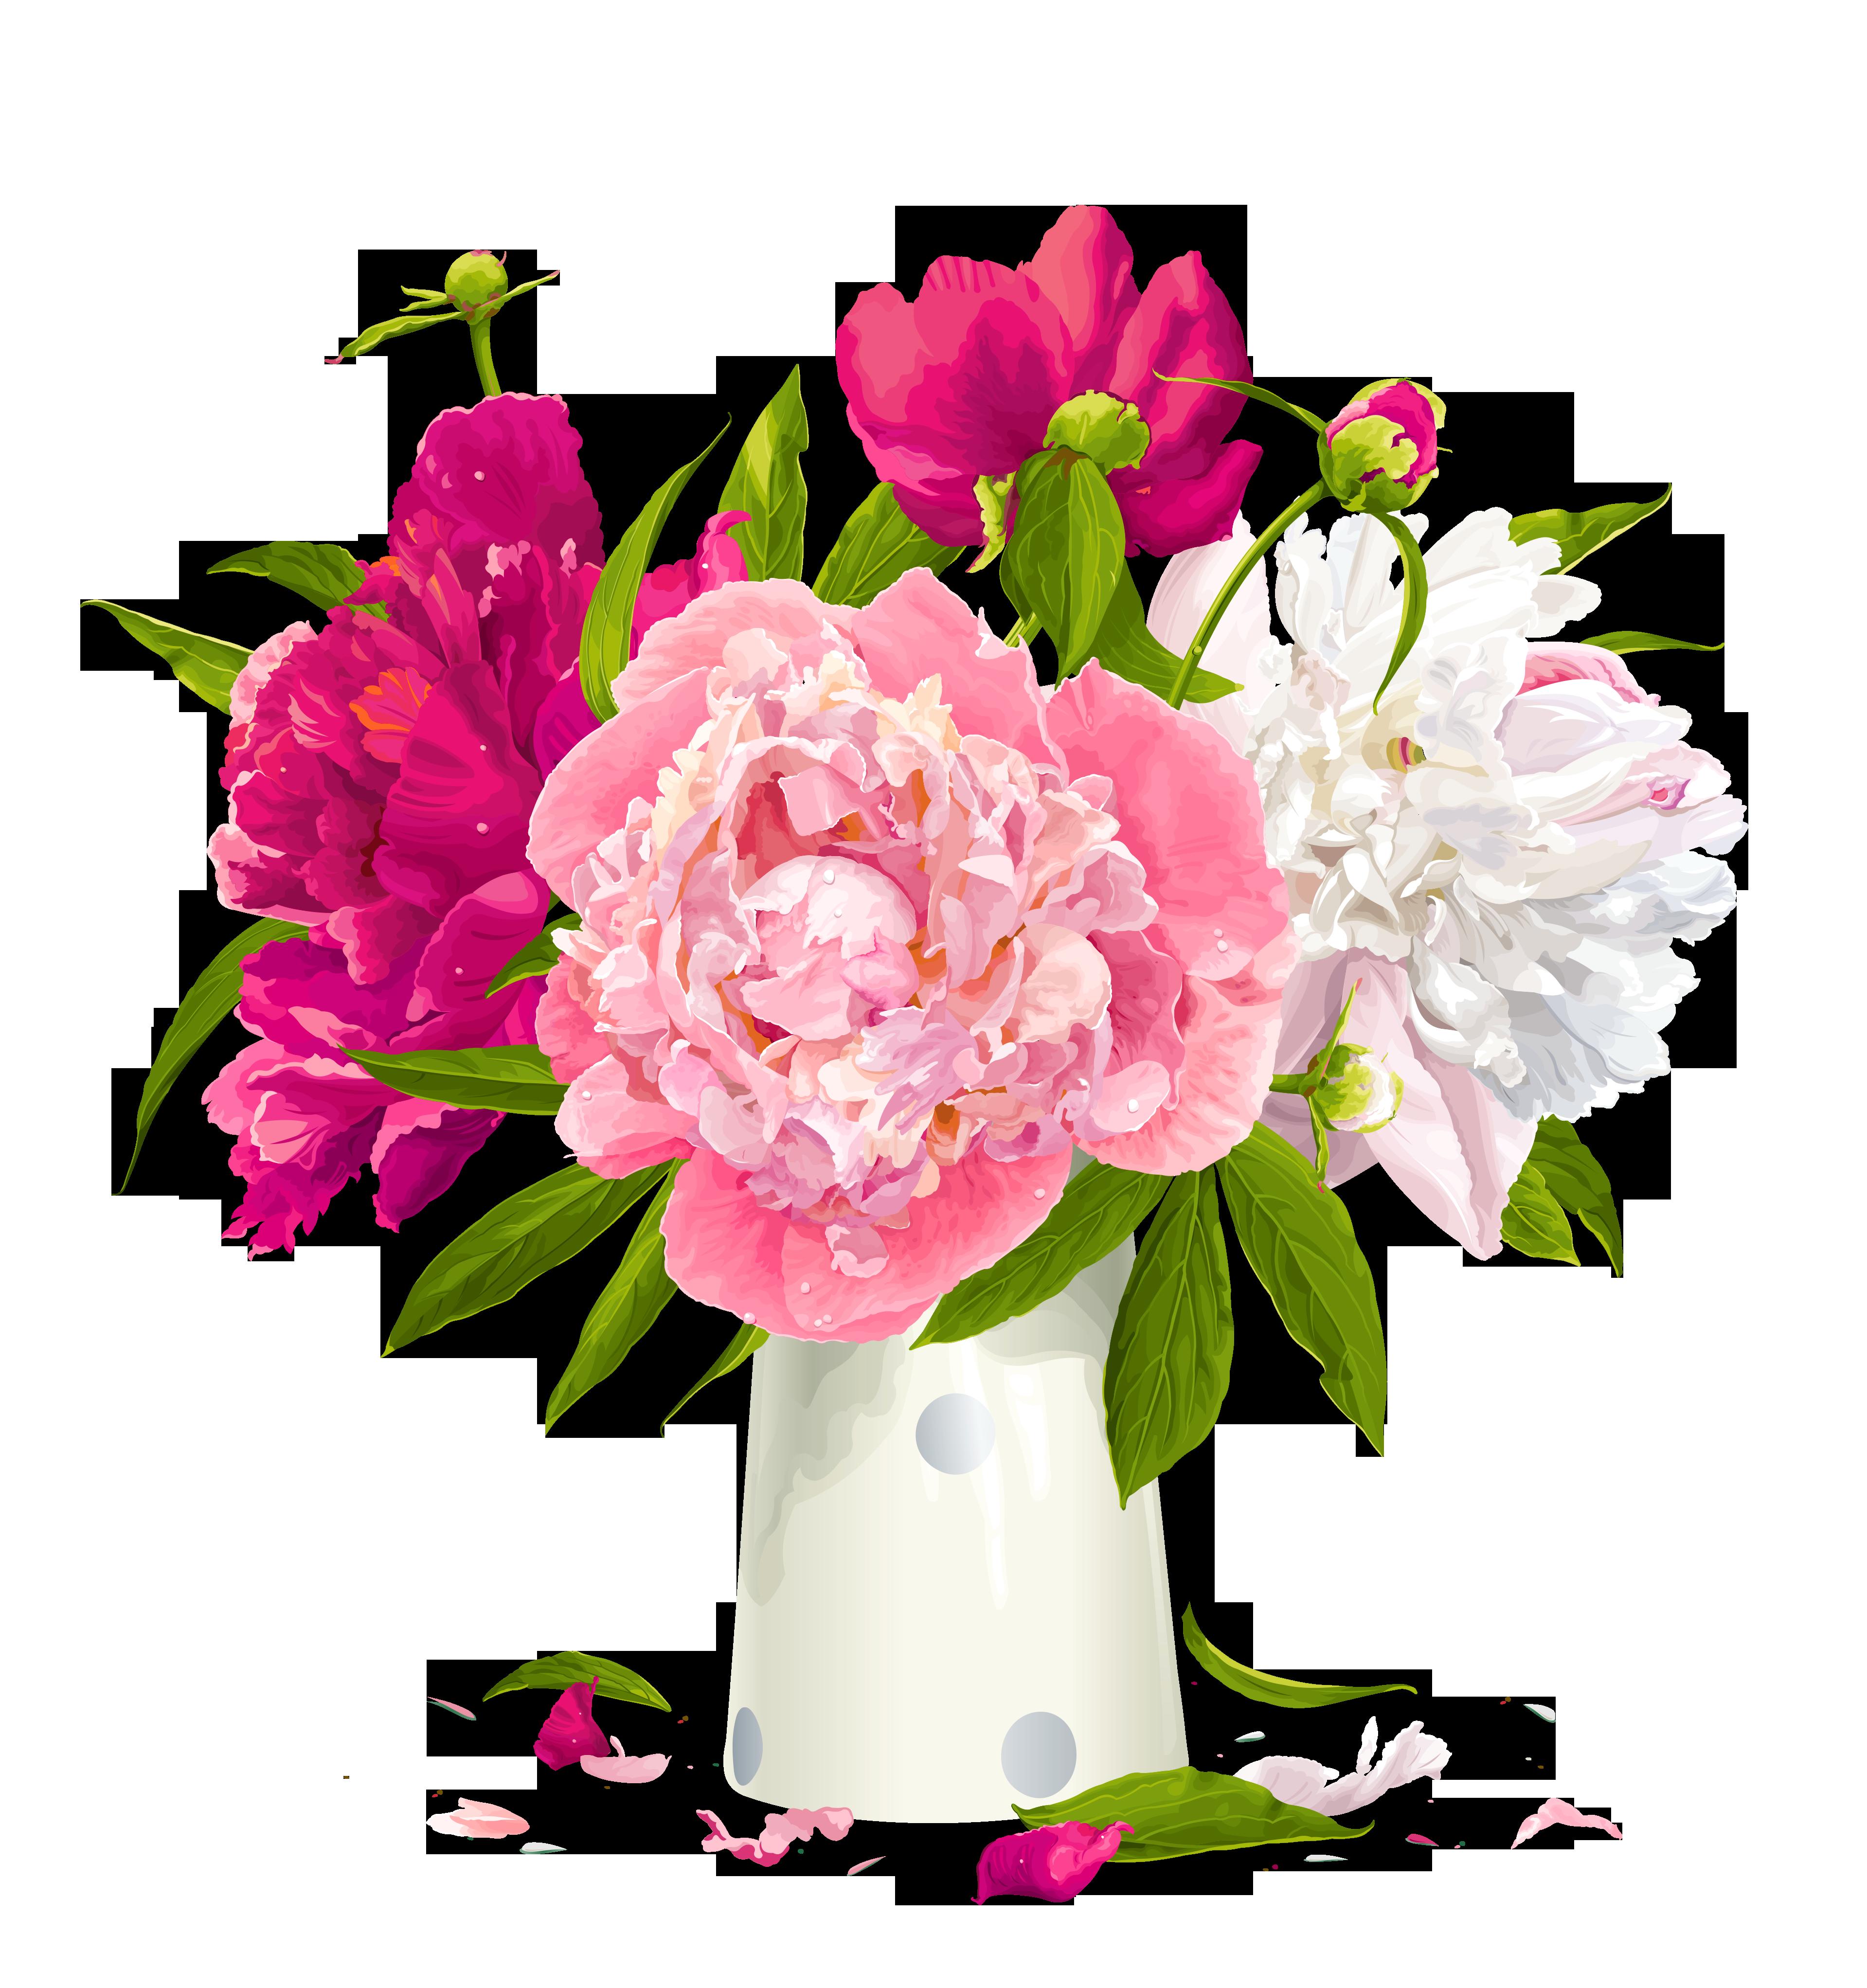 clipart freeuse download Gallery clip art vase. Bouquet clipart flower bucket.